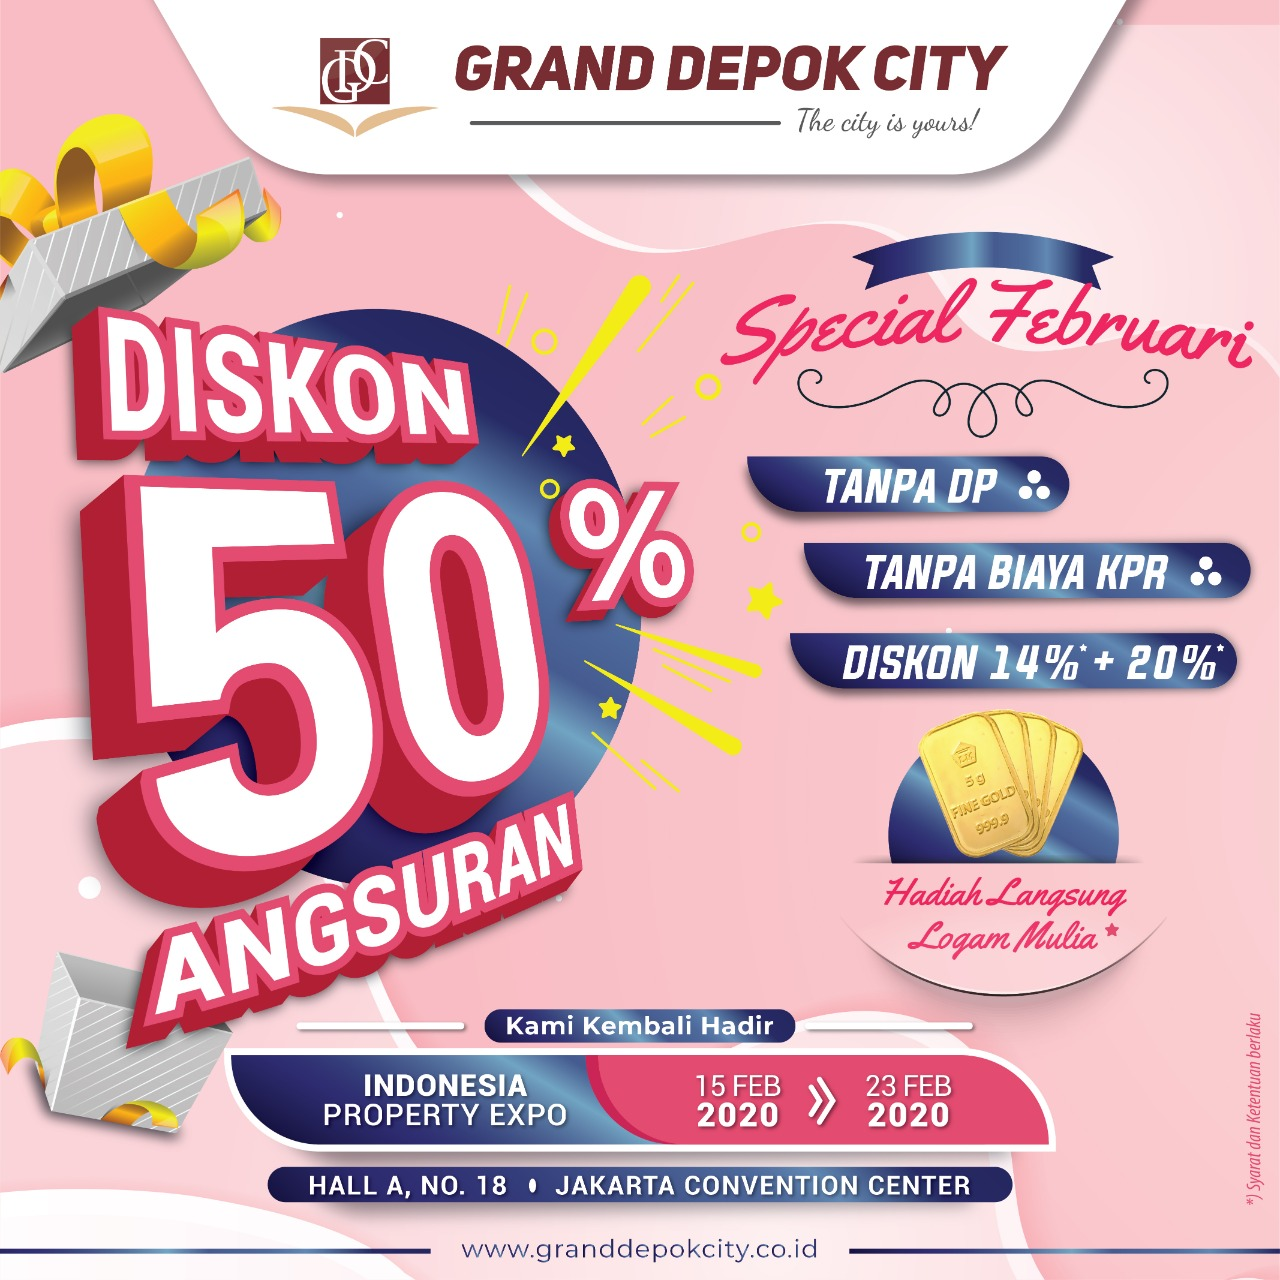 Special Februari Diskon 50%